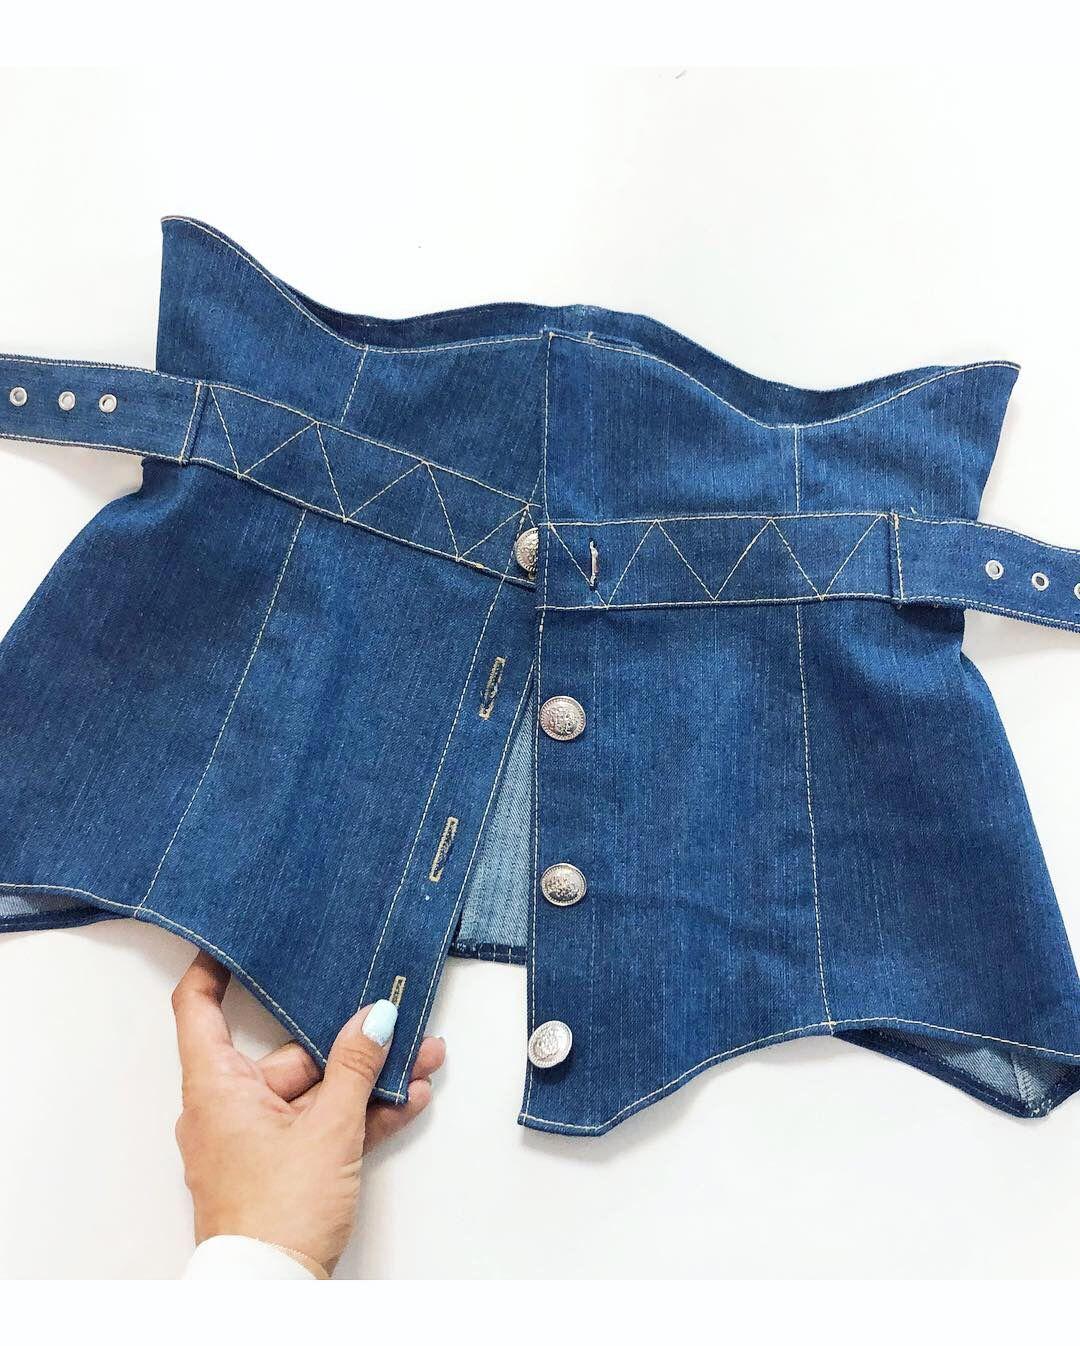 Обои button , Джинсы, Jeans, пуговица, Одежда, clothing. Разное foto 11